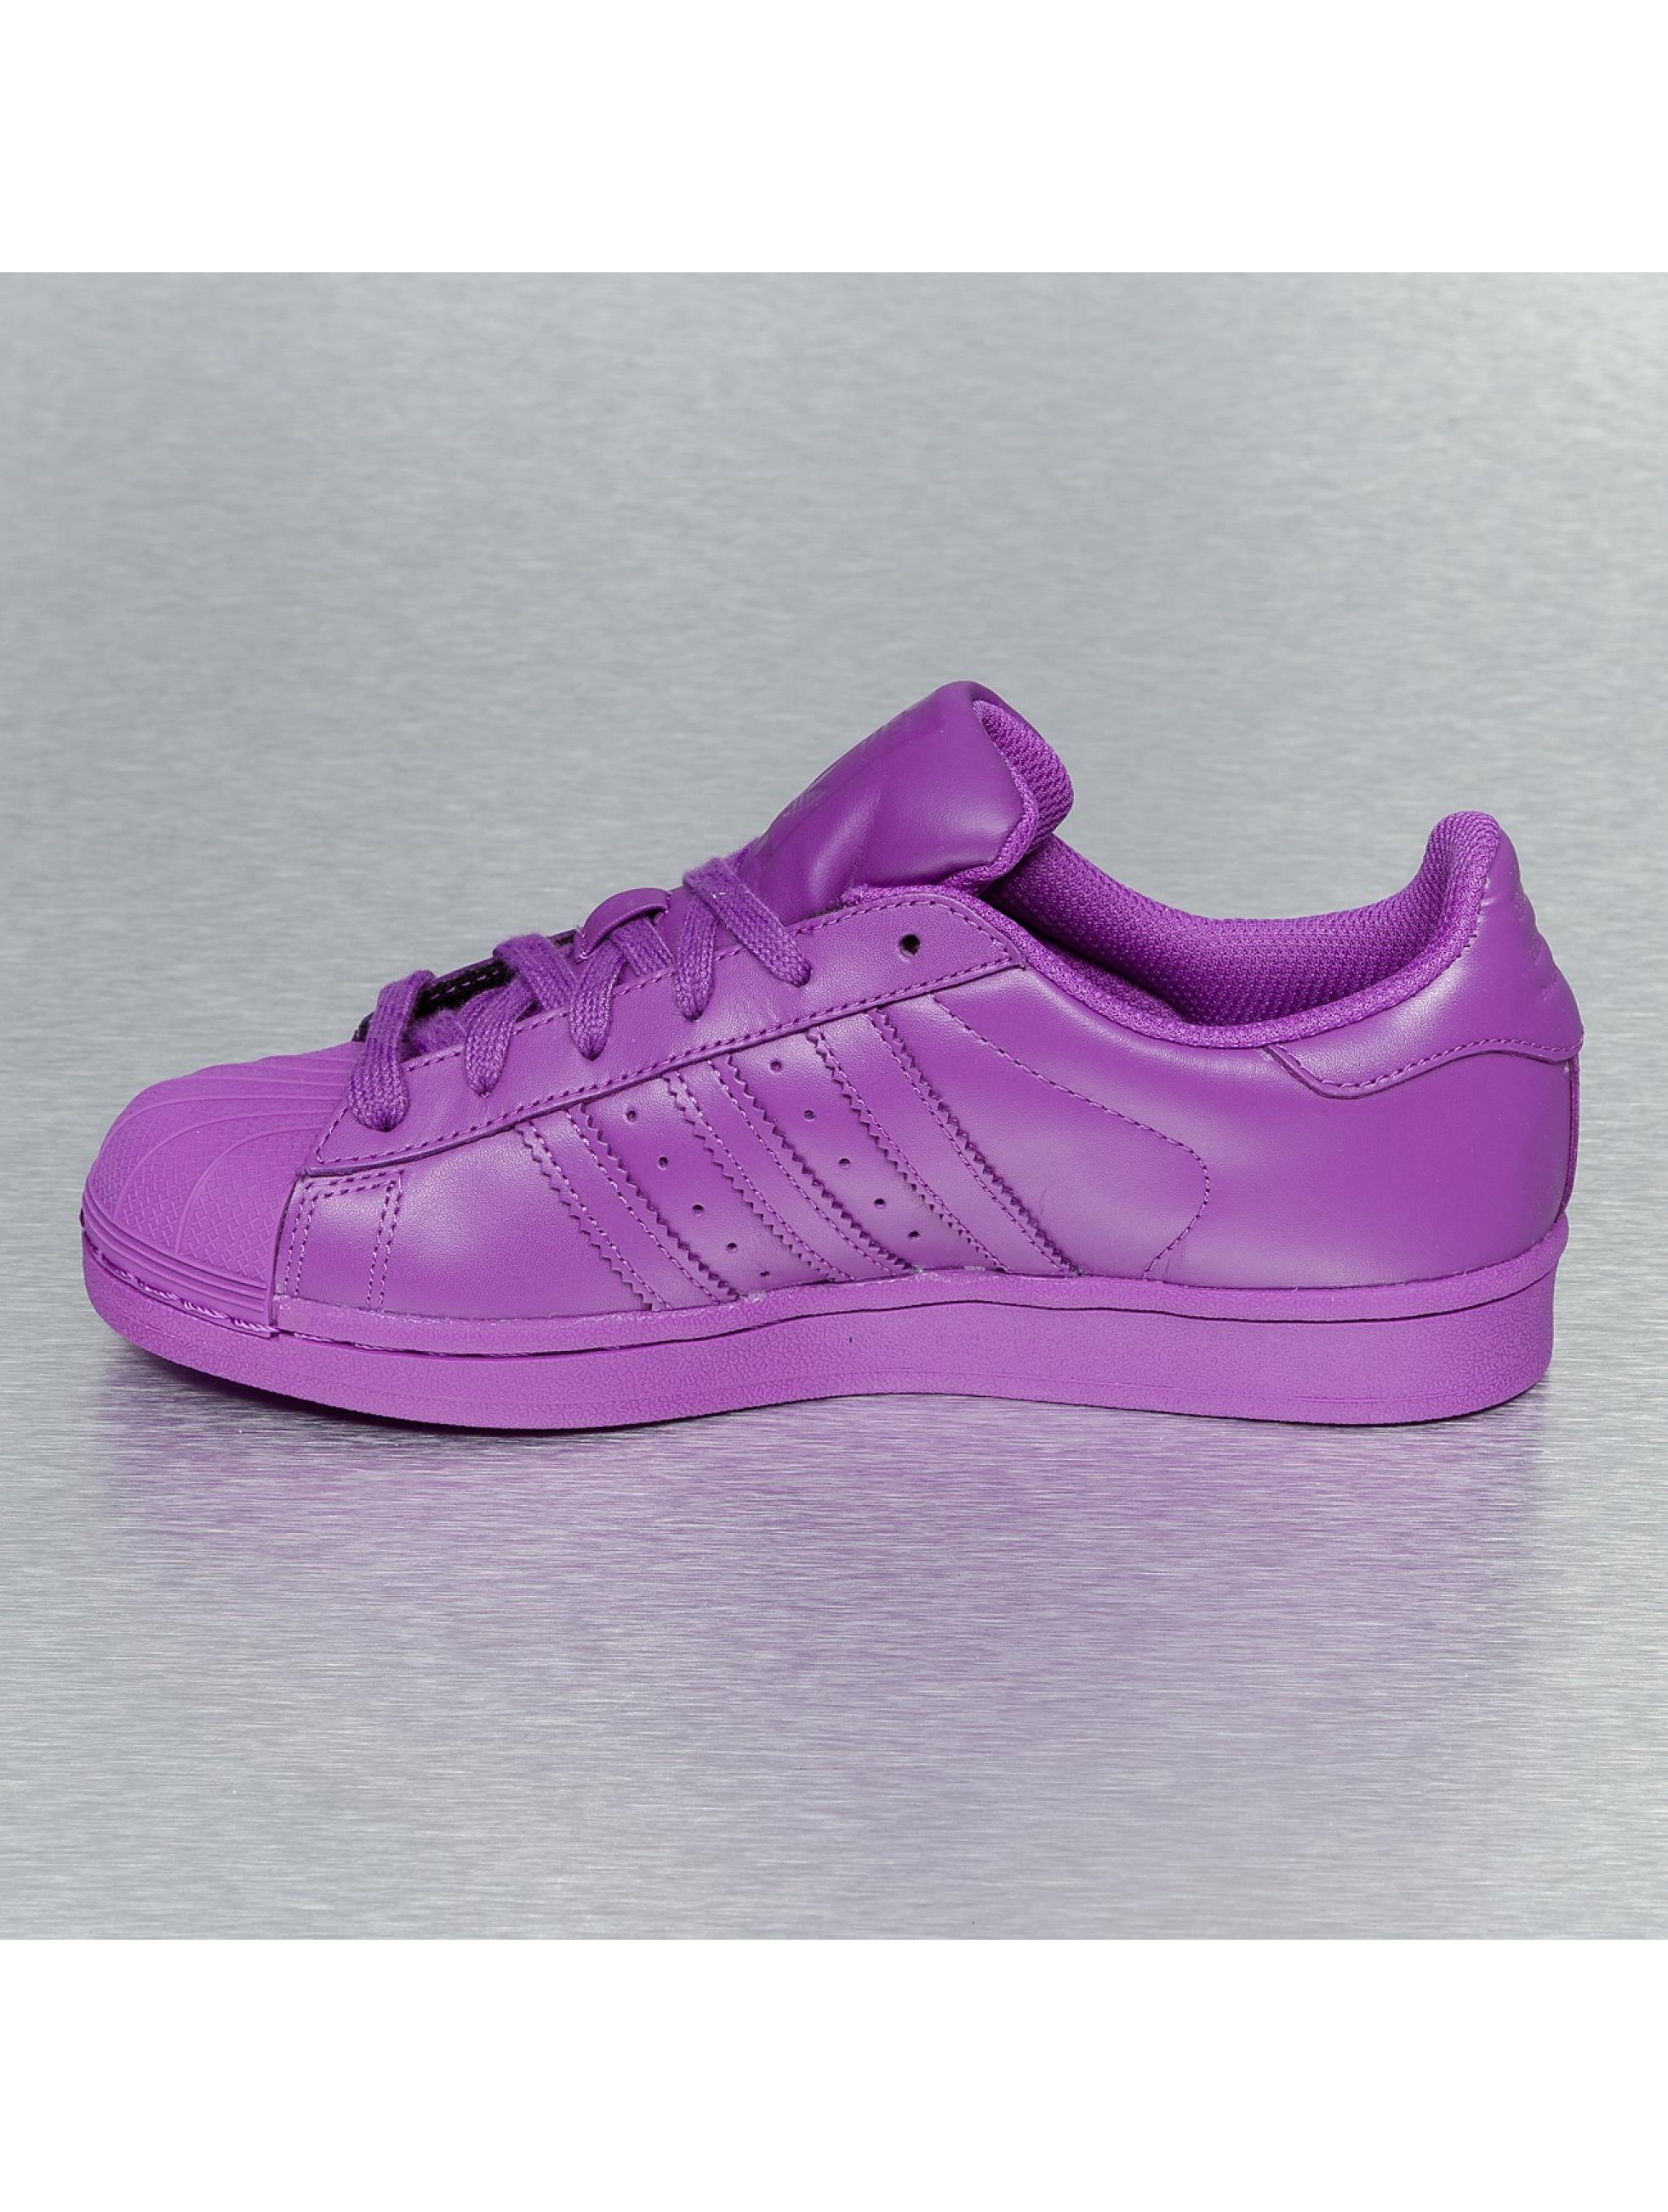 adidas superstar dames paars